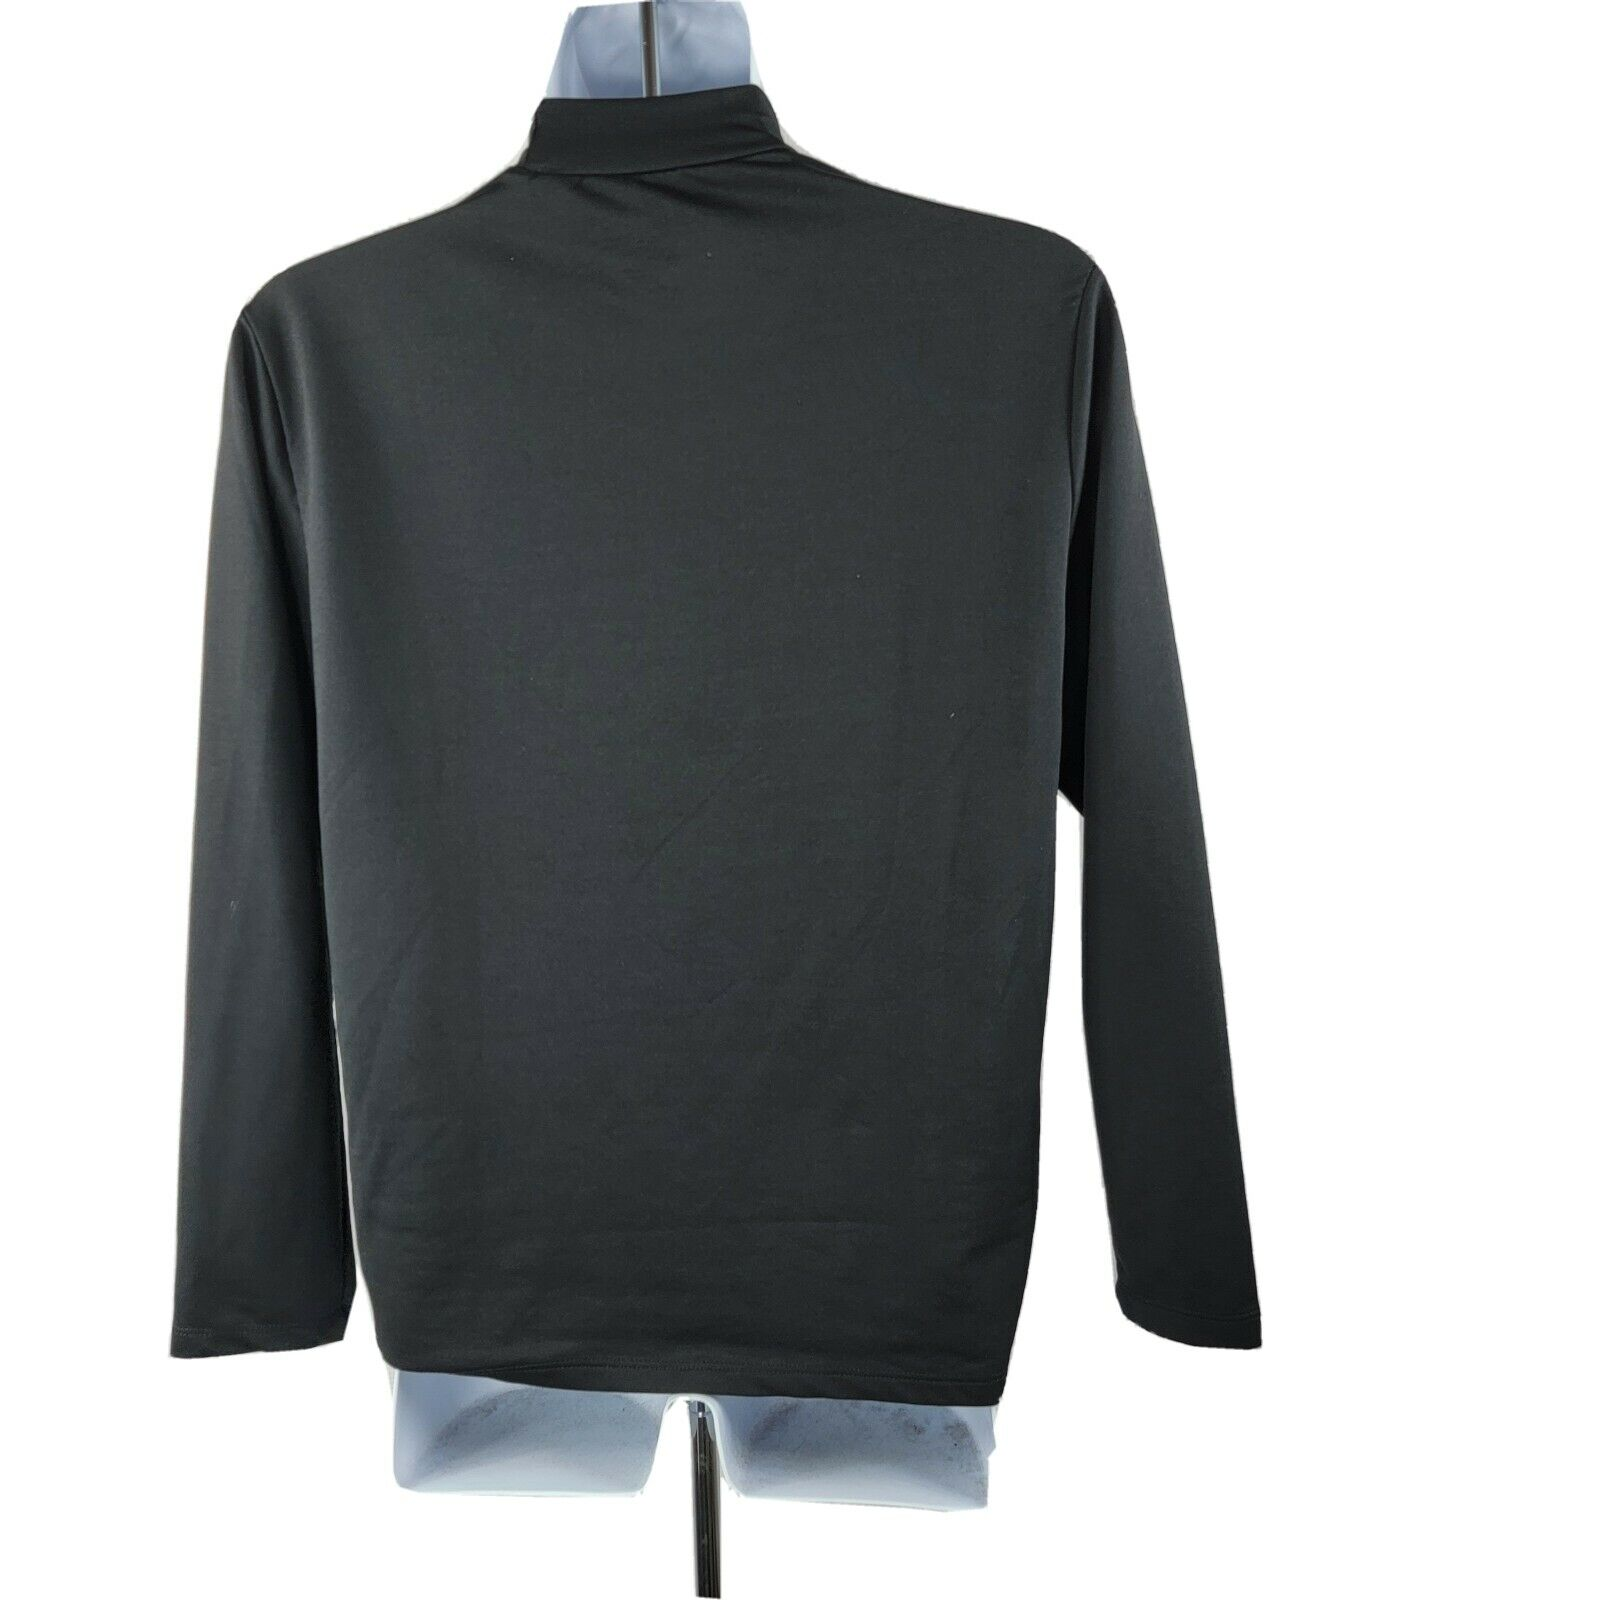 Dickies Long-Sleeve Pullover Performance T-Shirt Medium Black Stretch